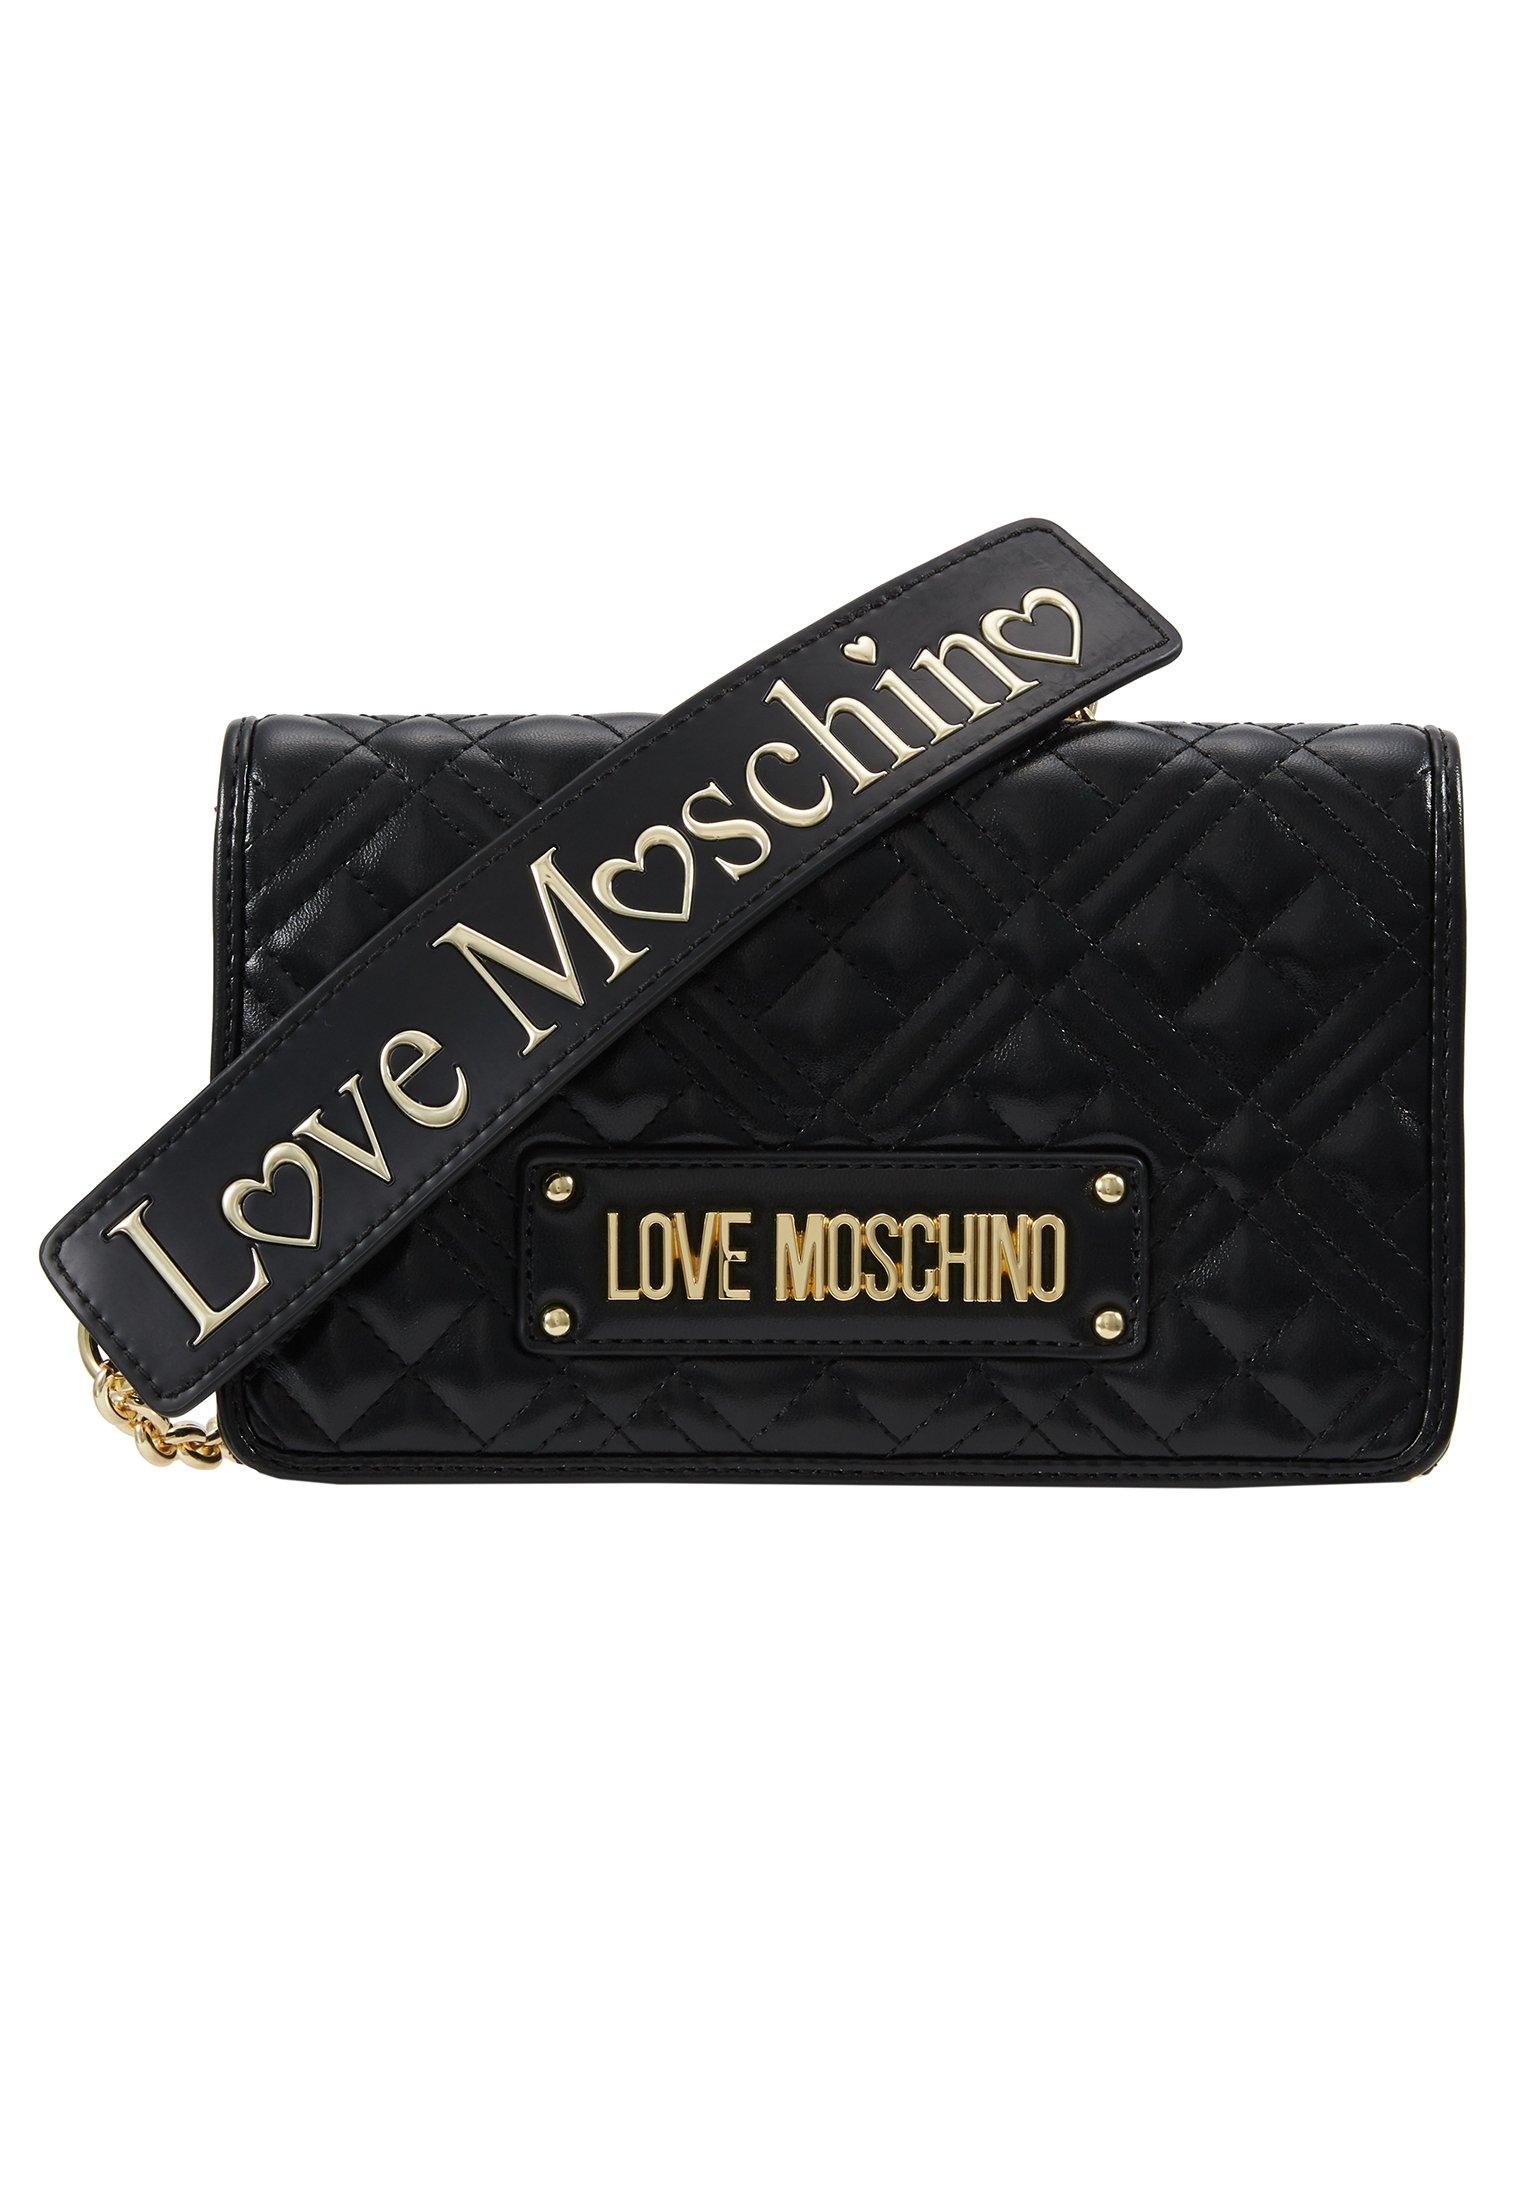 Love Moschino Clutches - black